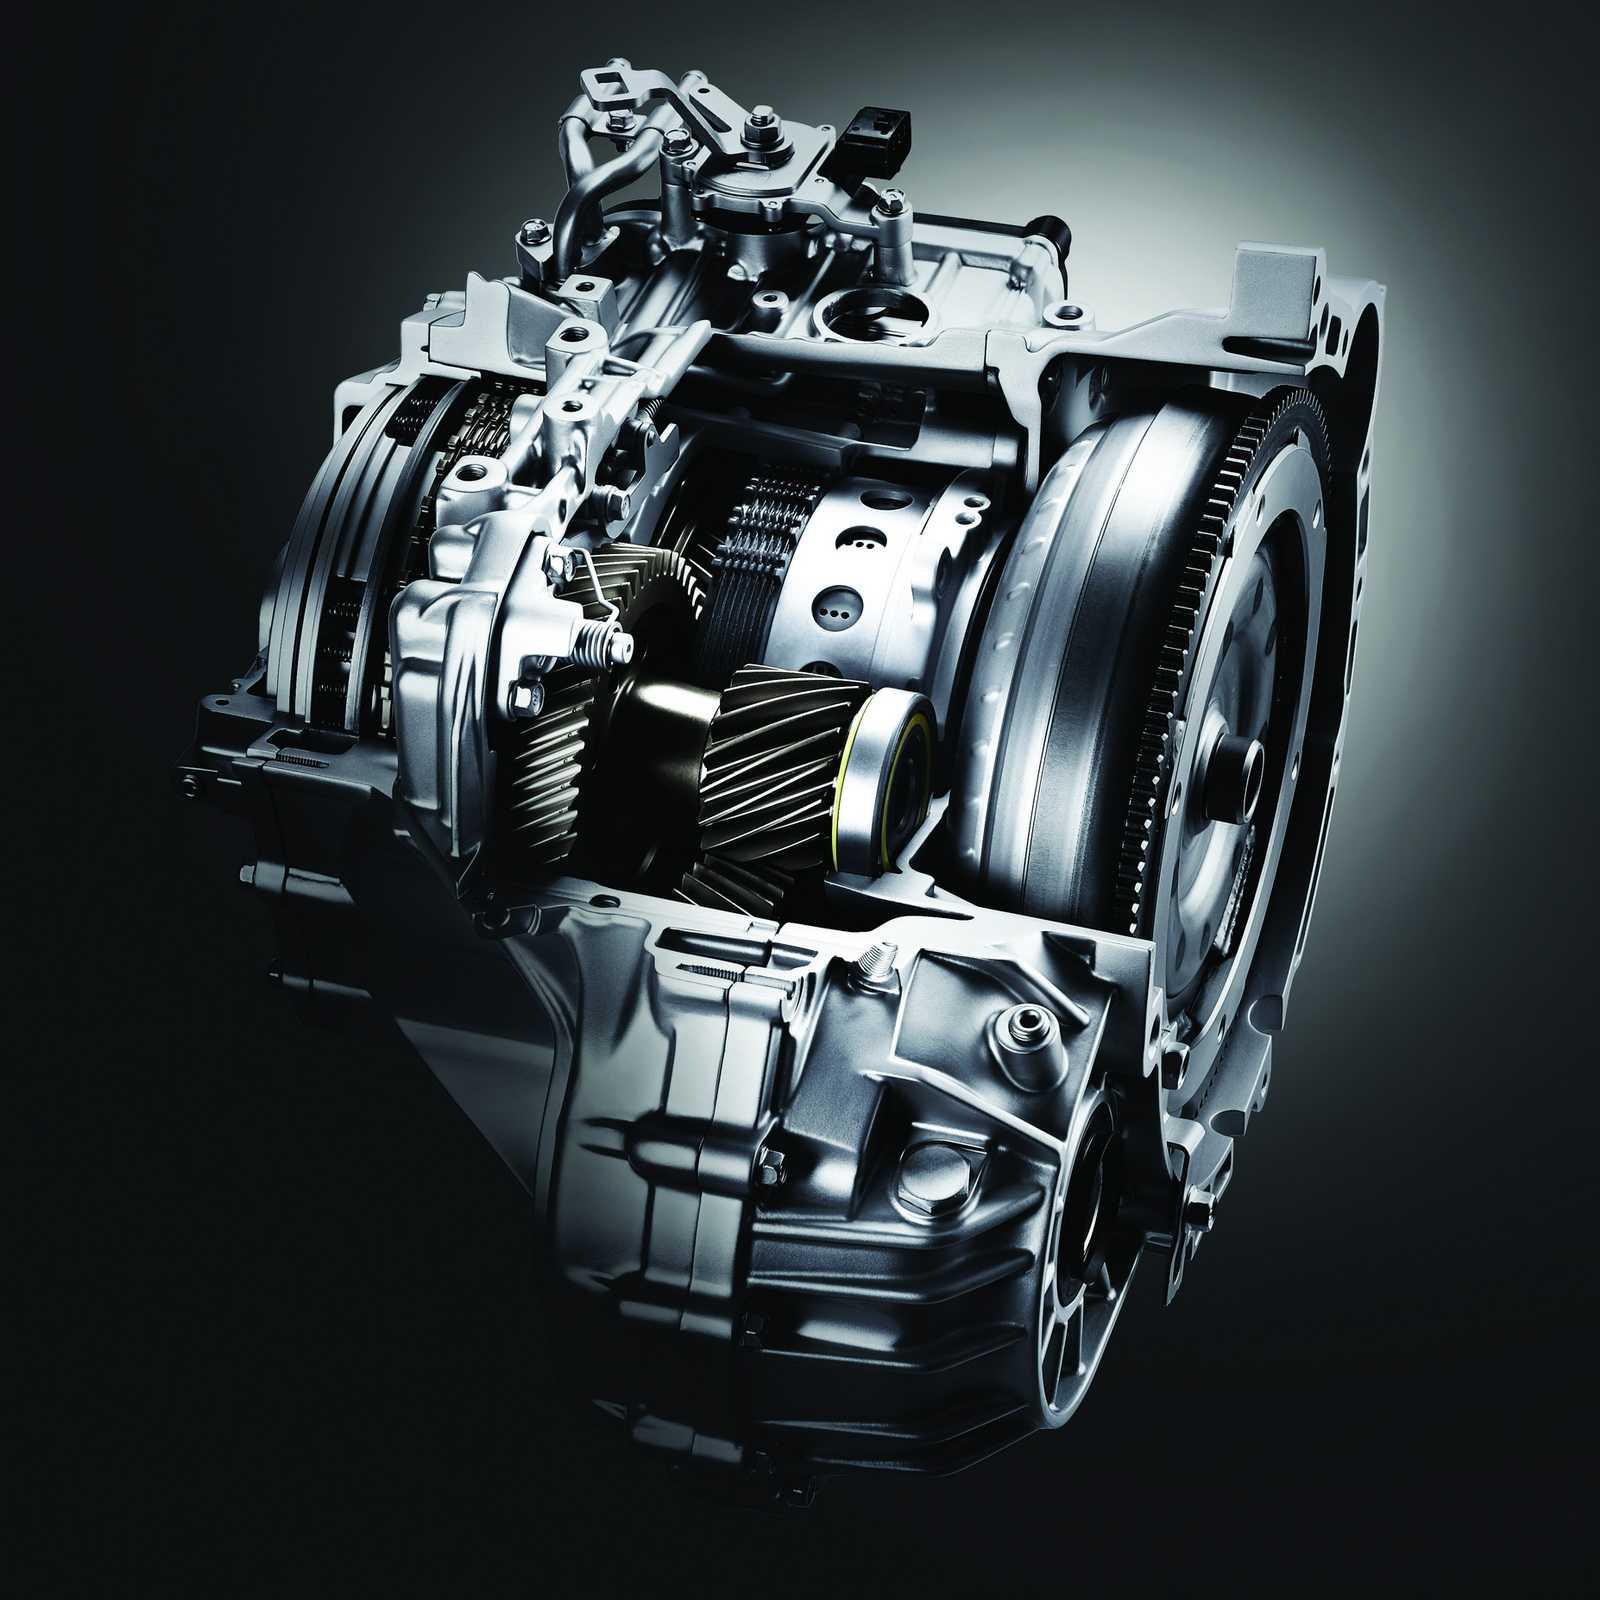 2016-kia-8-speed-auto-gearbox-1